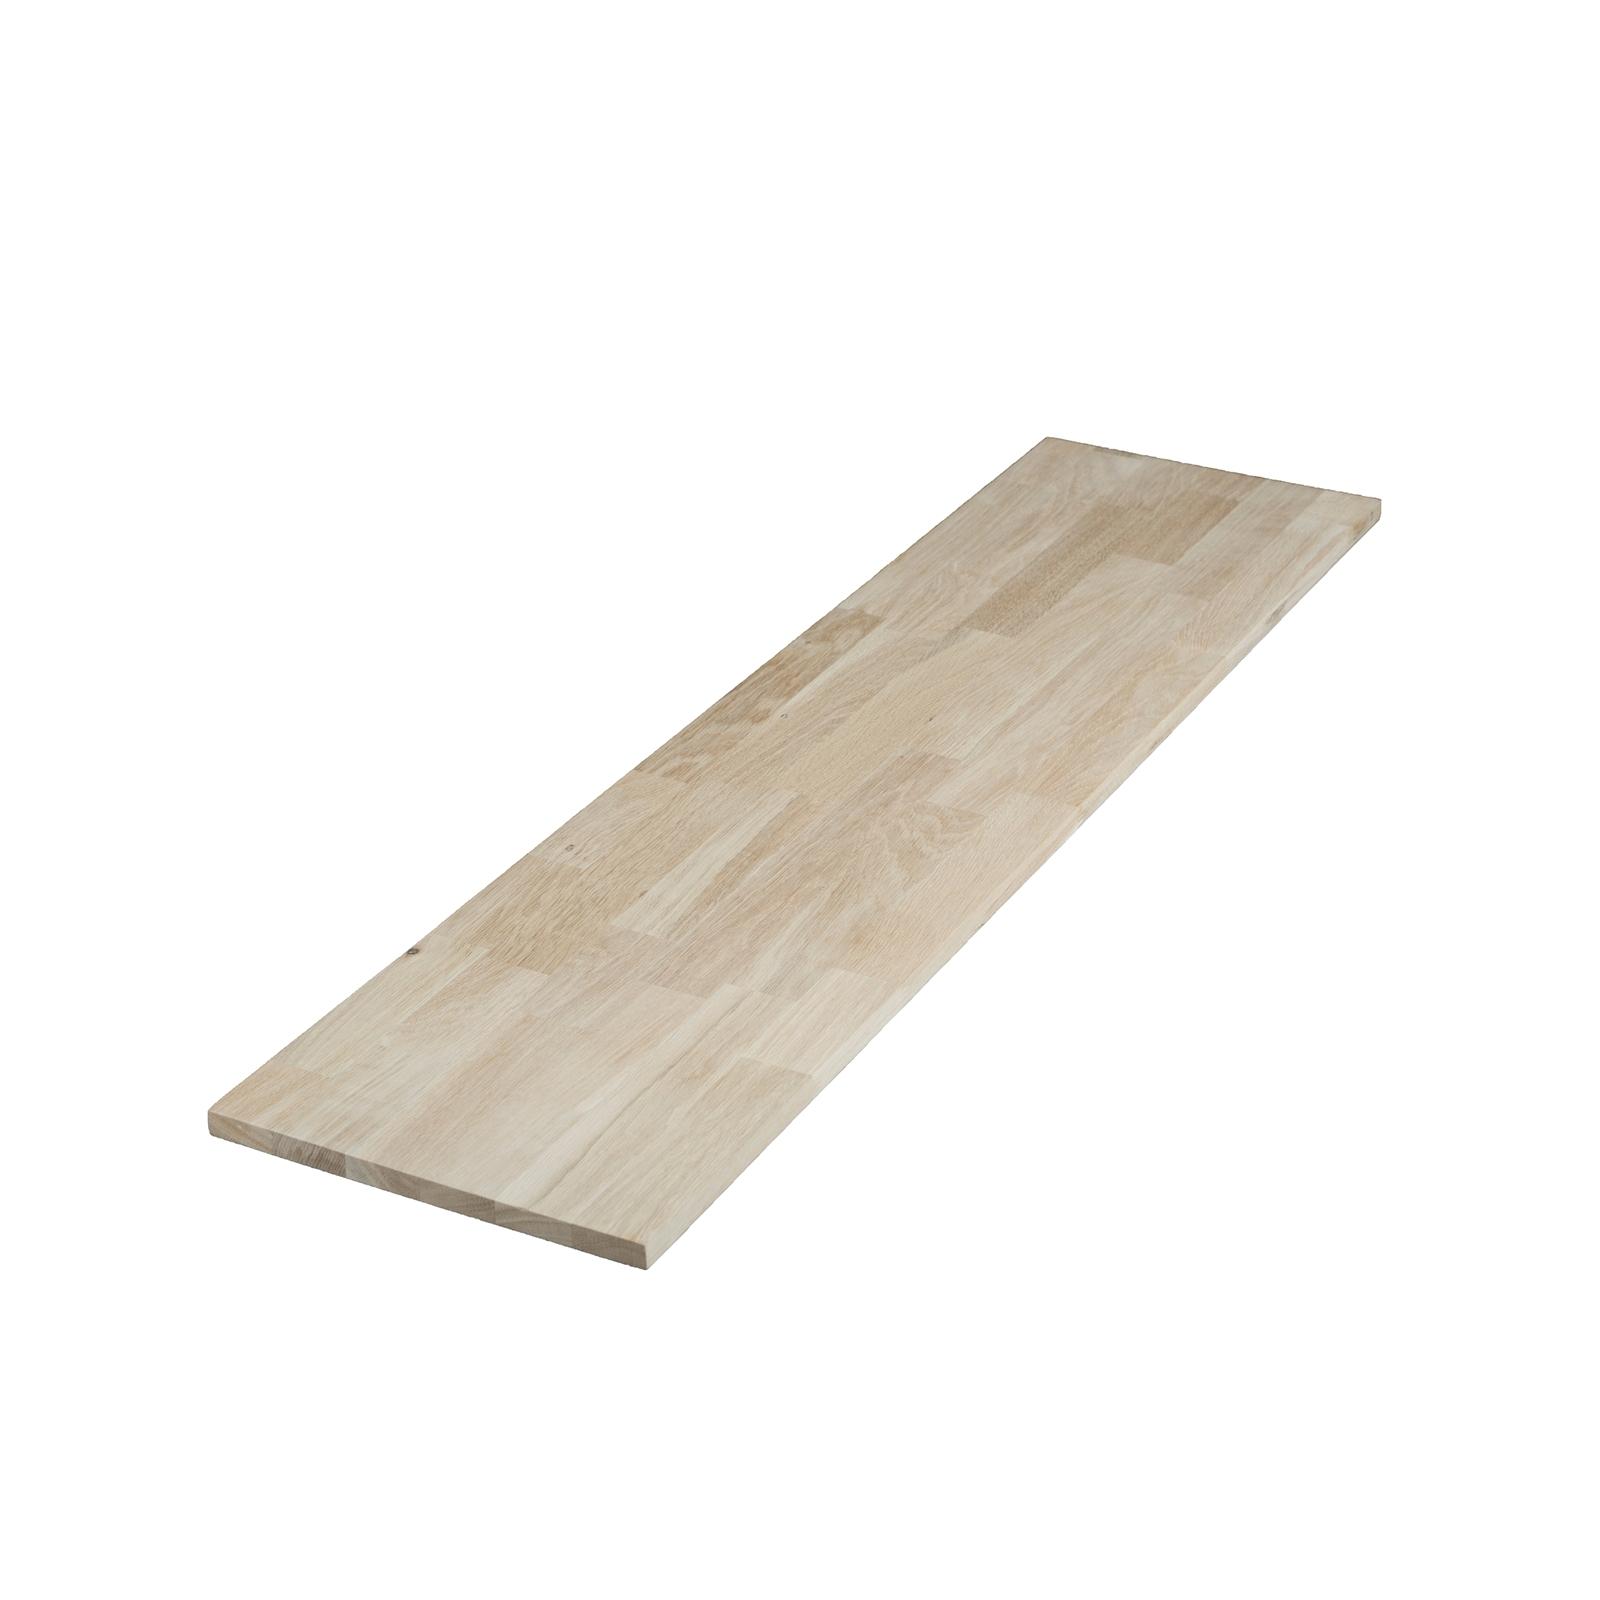 1200 x 405 x 18mm Finger Jointed Oak Panel